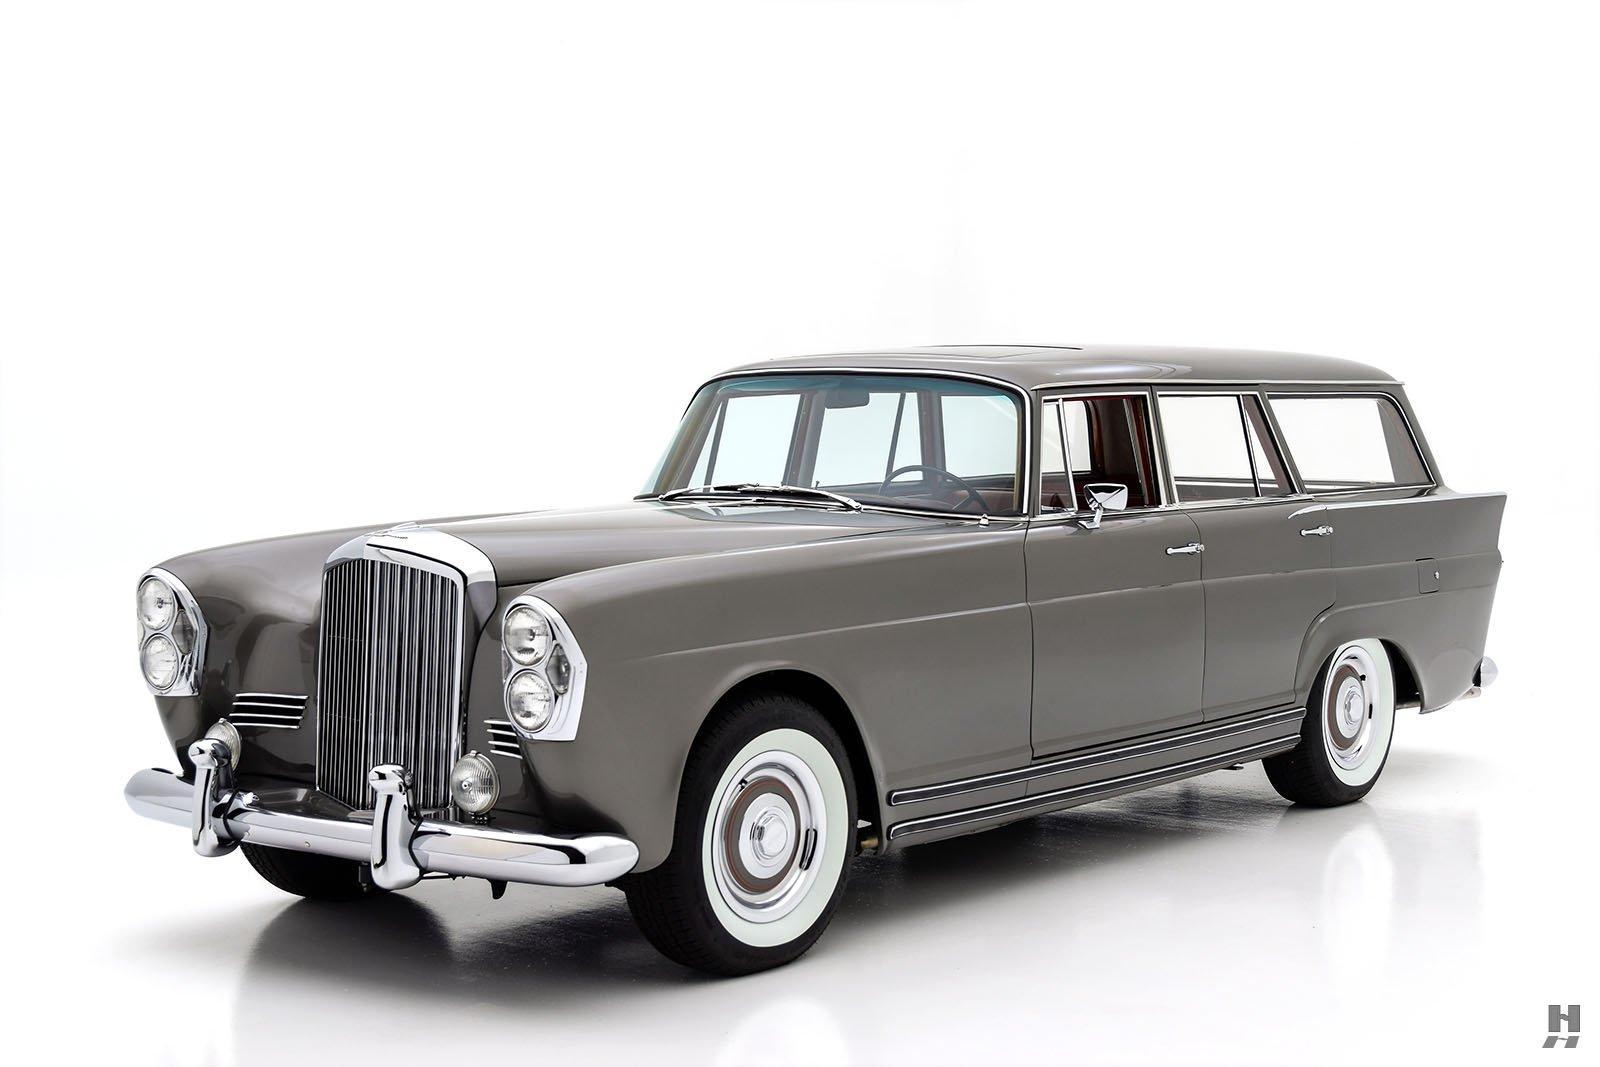 1960 Bentley S2 Wendler Shooting Brake For Sale at Hyman LTD